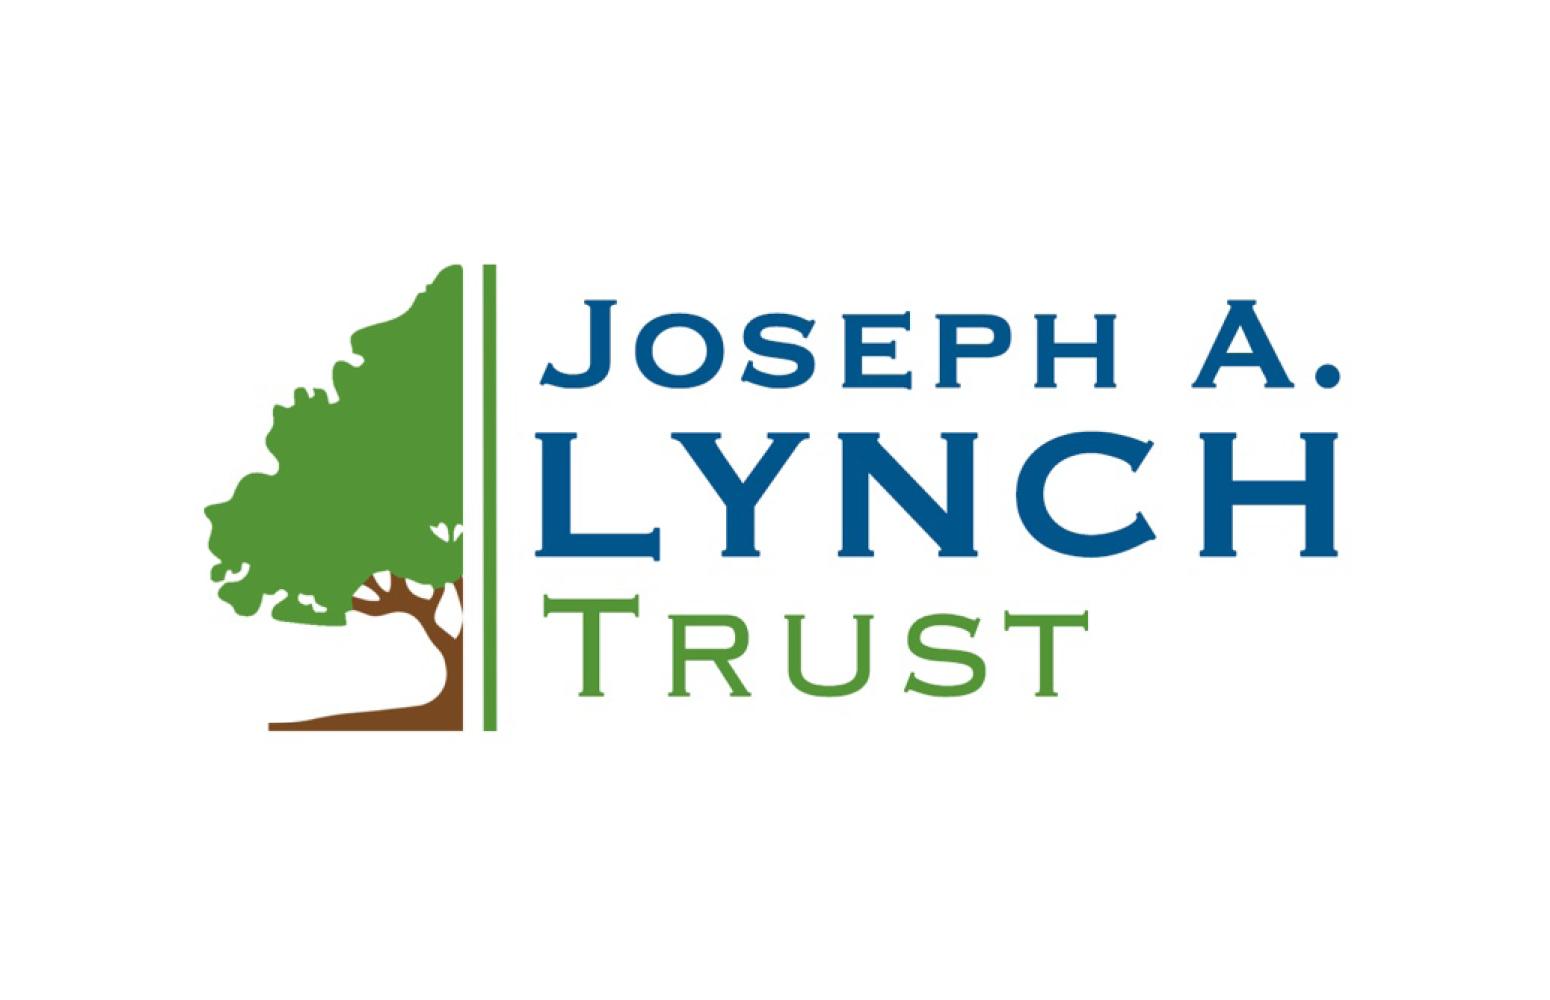 Joseph A. Lynch Trust